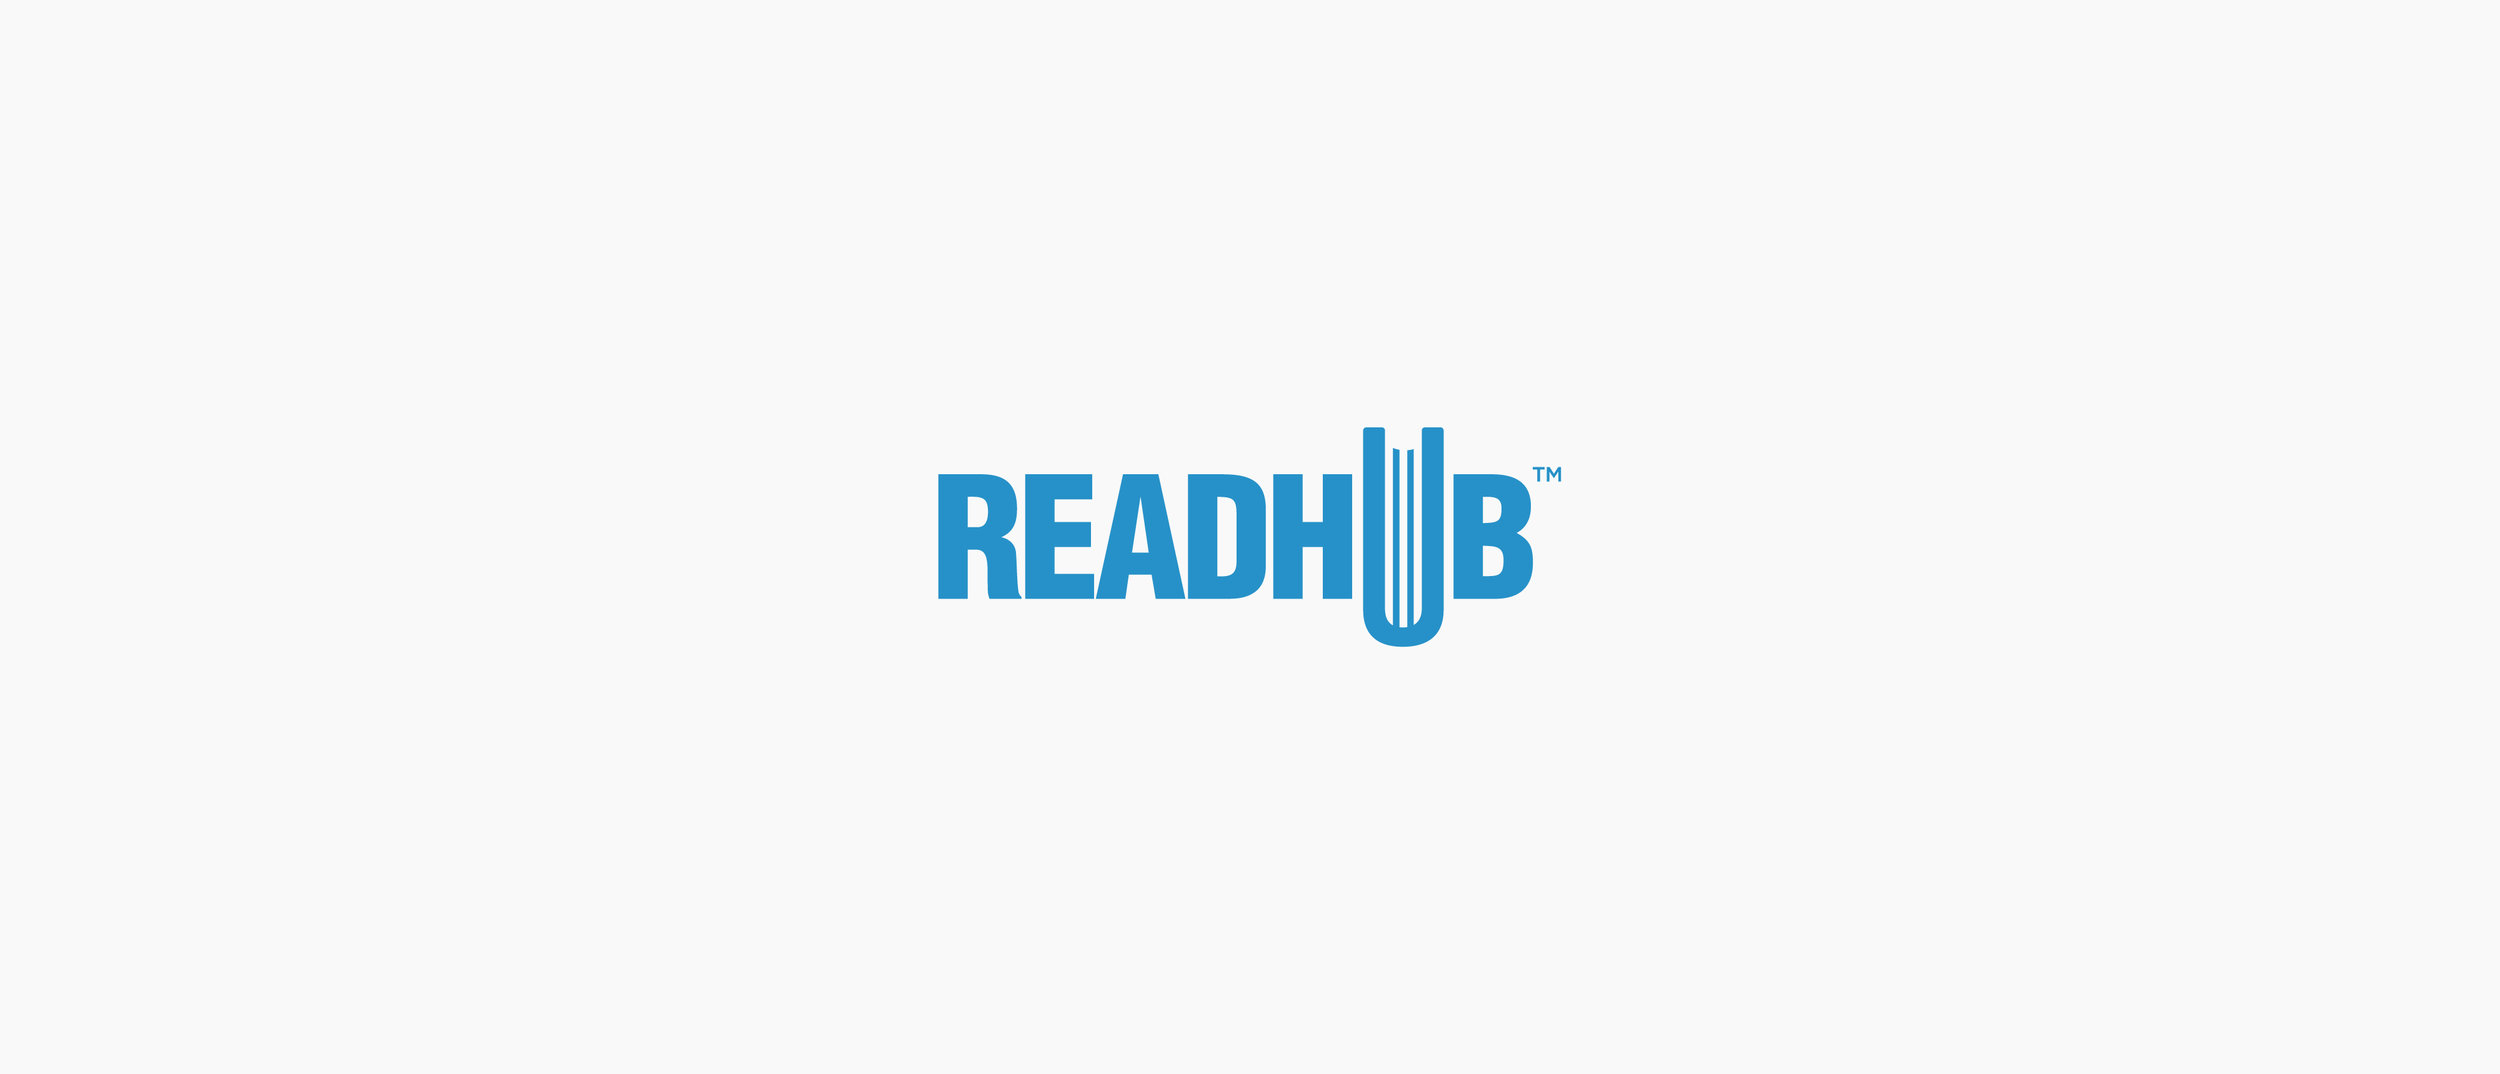 ReadHub | Mobile Library | 2015